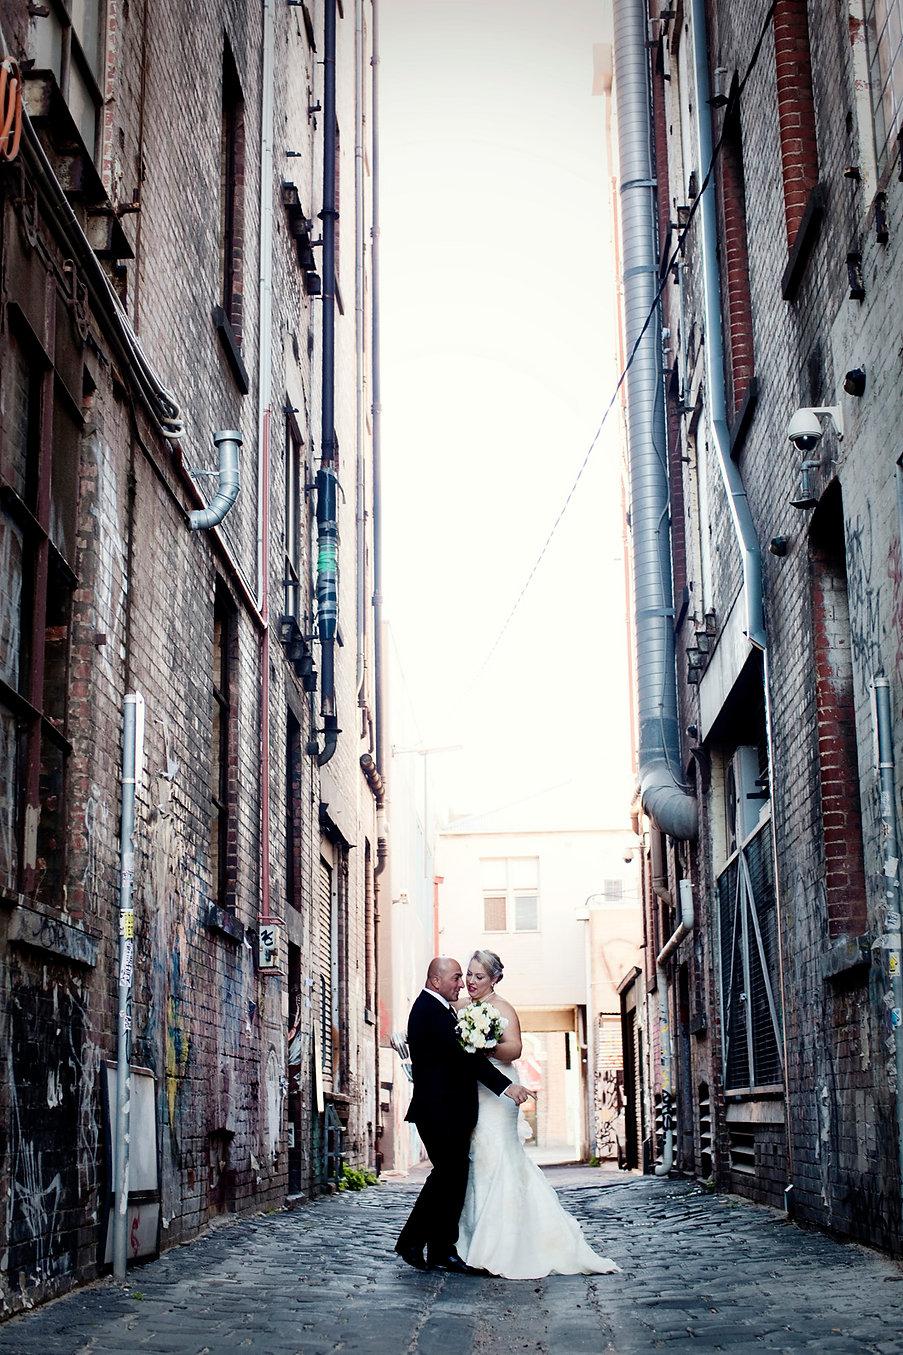 birde and groom photos down Melbourne Laneway, Fitzroy